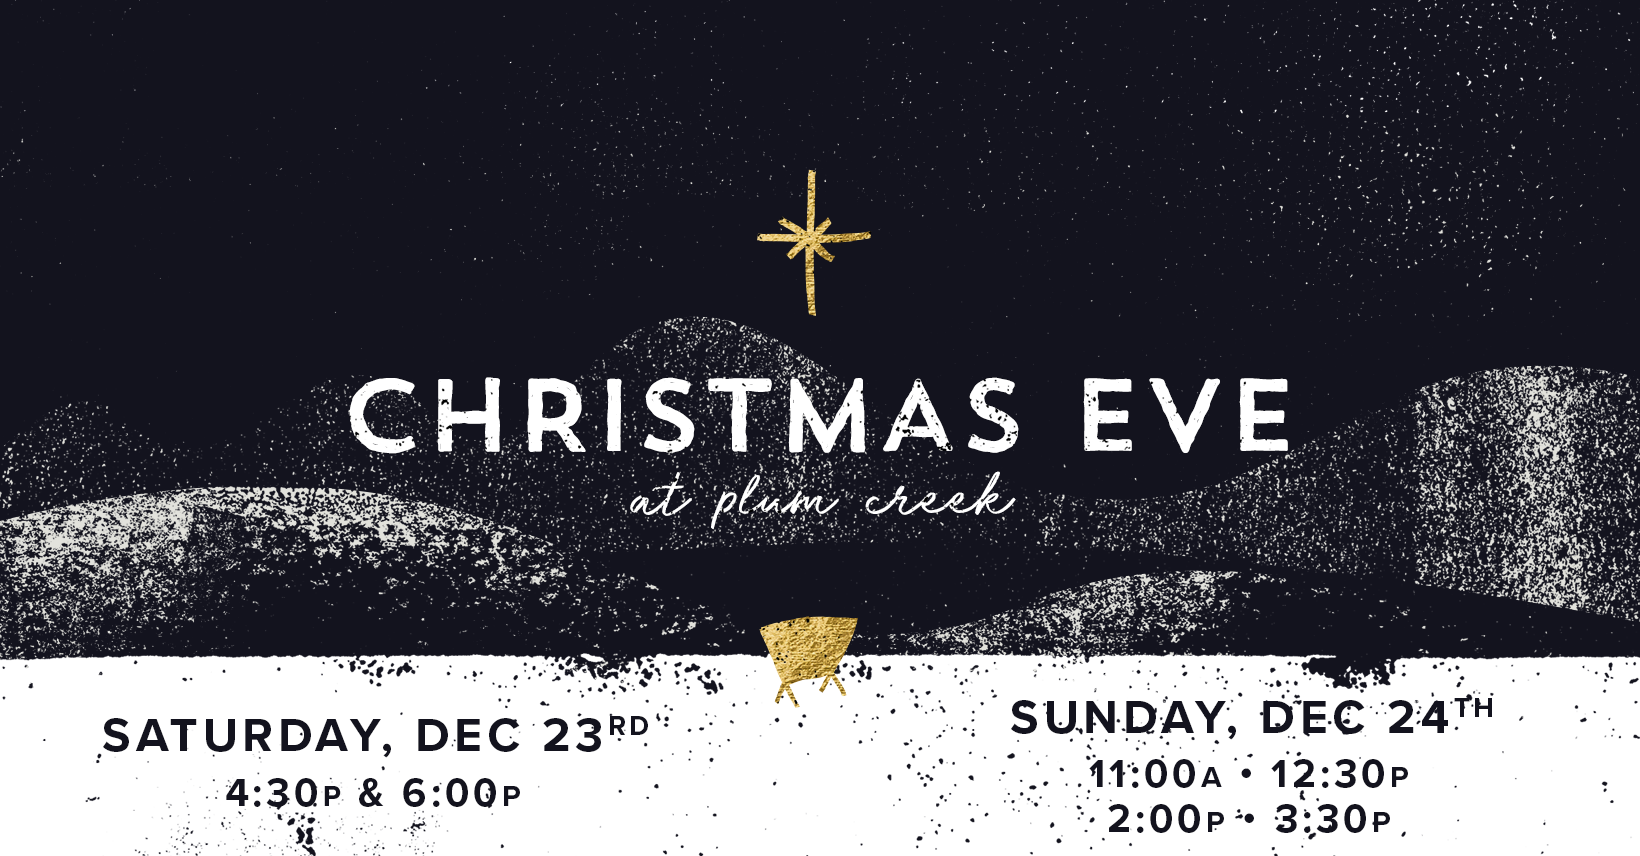 PC-christmas-facebook-times FINAL FINAL FINAL.png